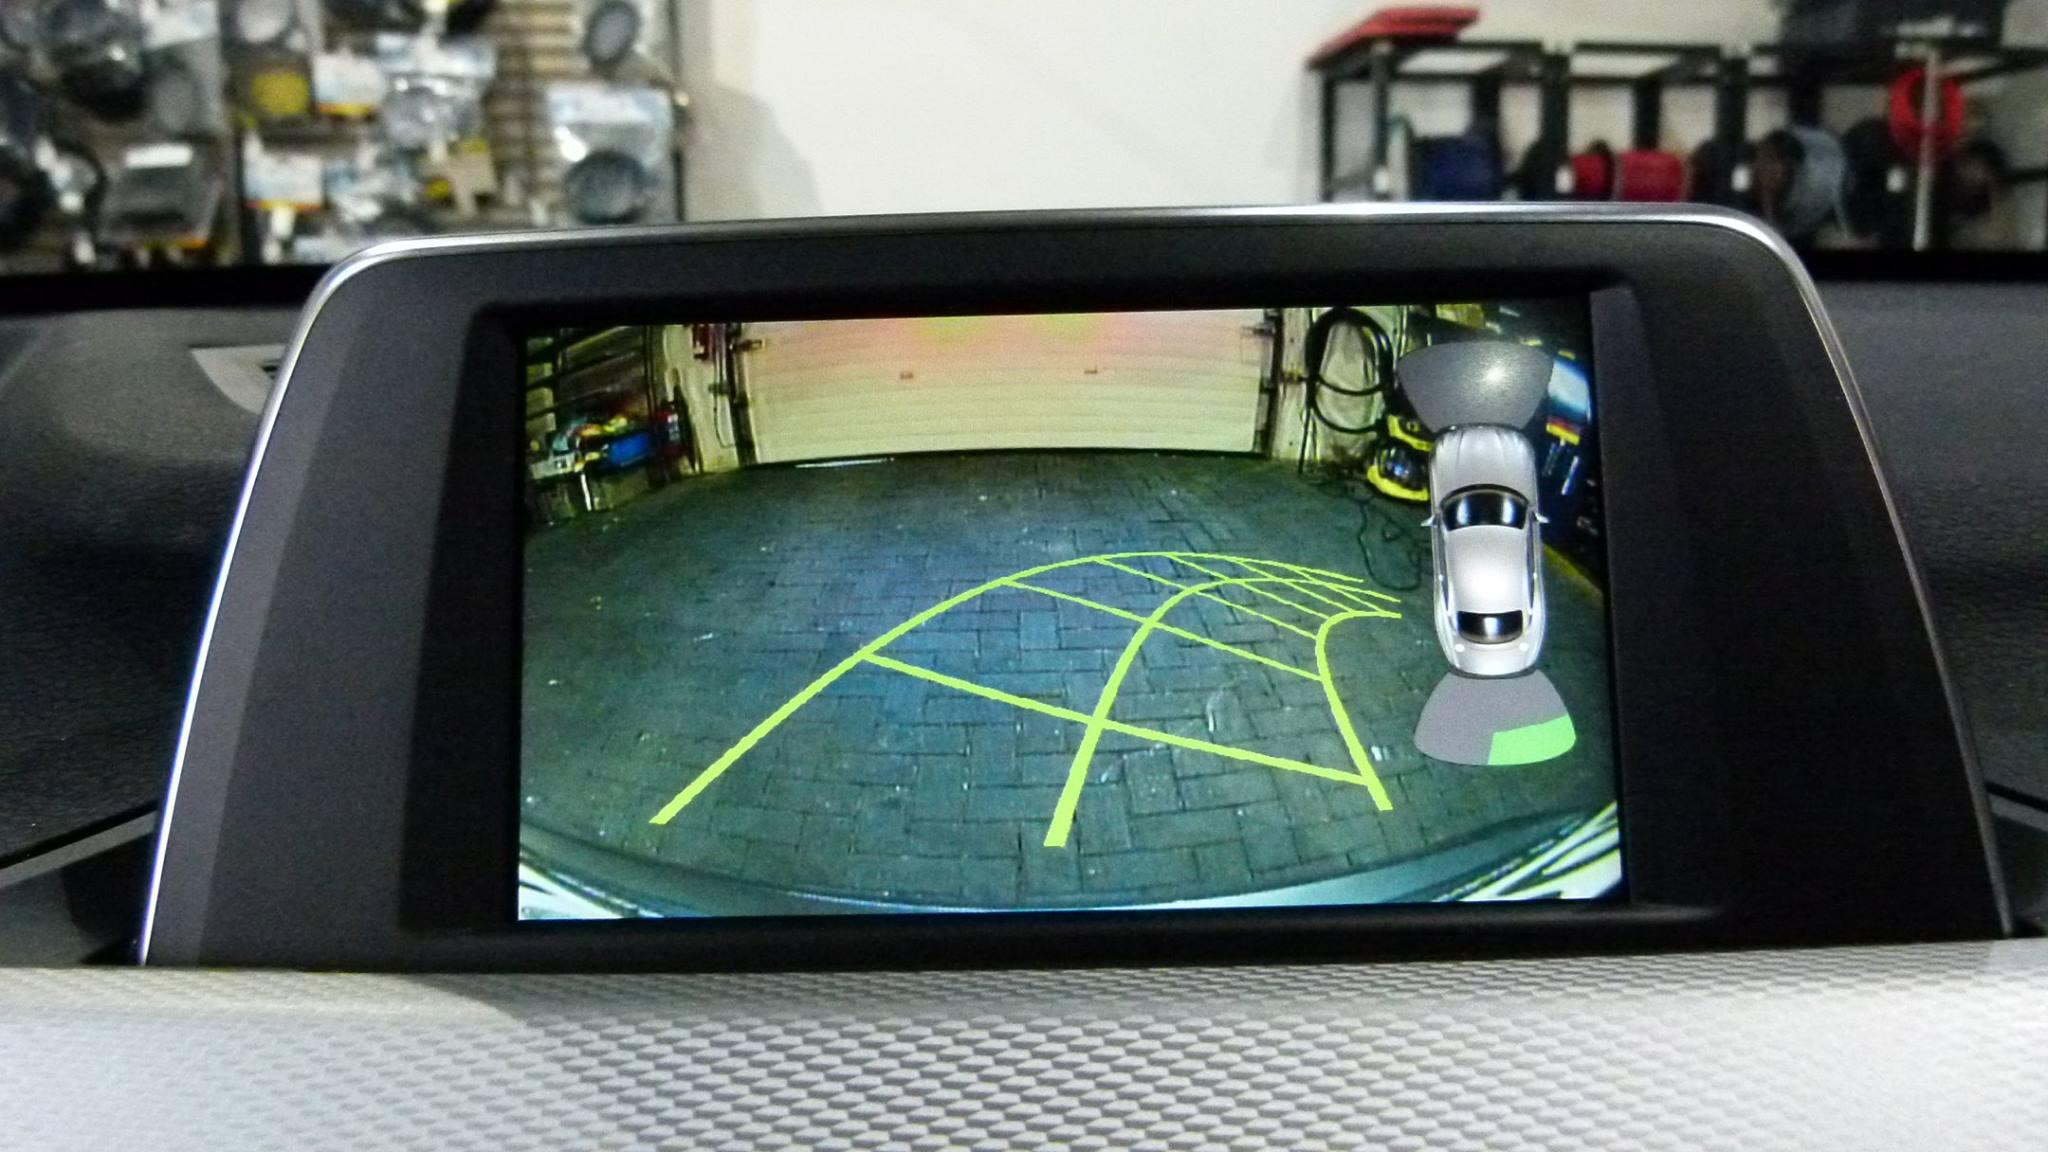 BMW X1 F48 Bj. 2015 | Griffleistenkamera an OEM Monitor nachgerüstet